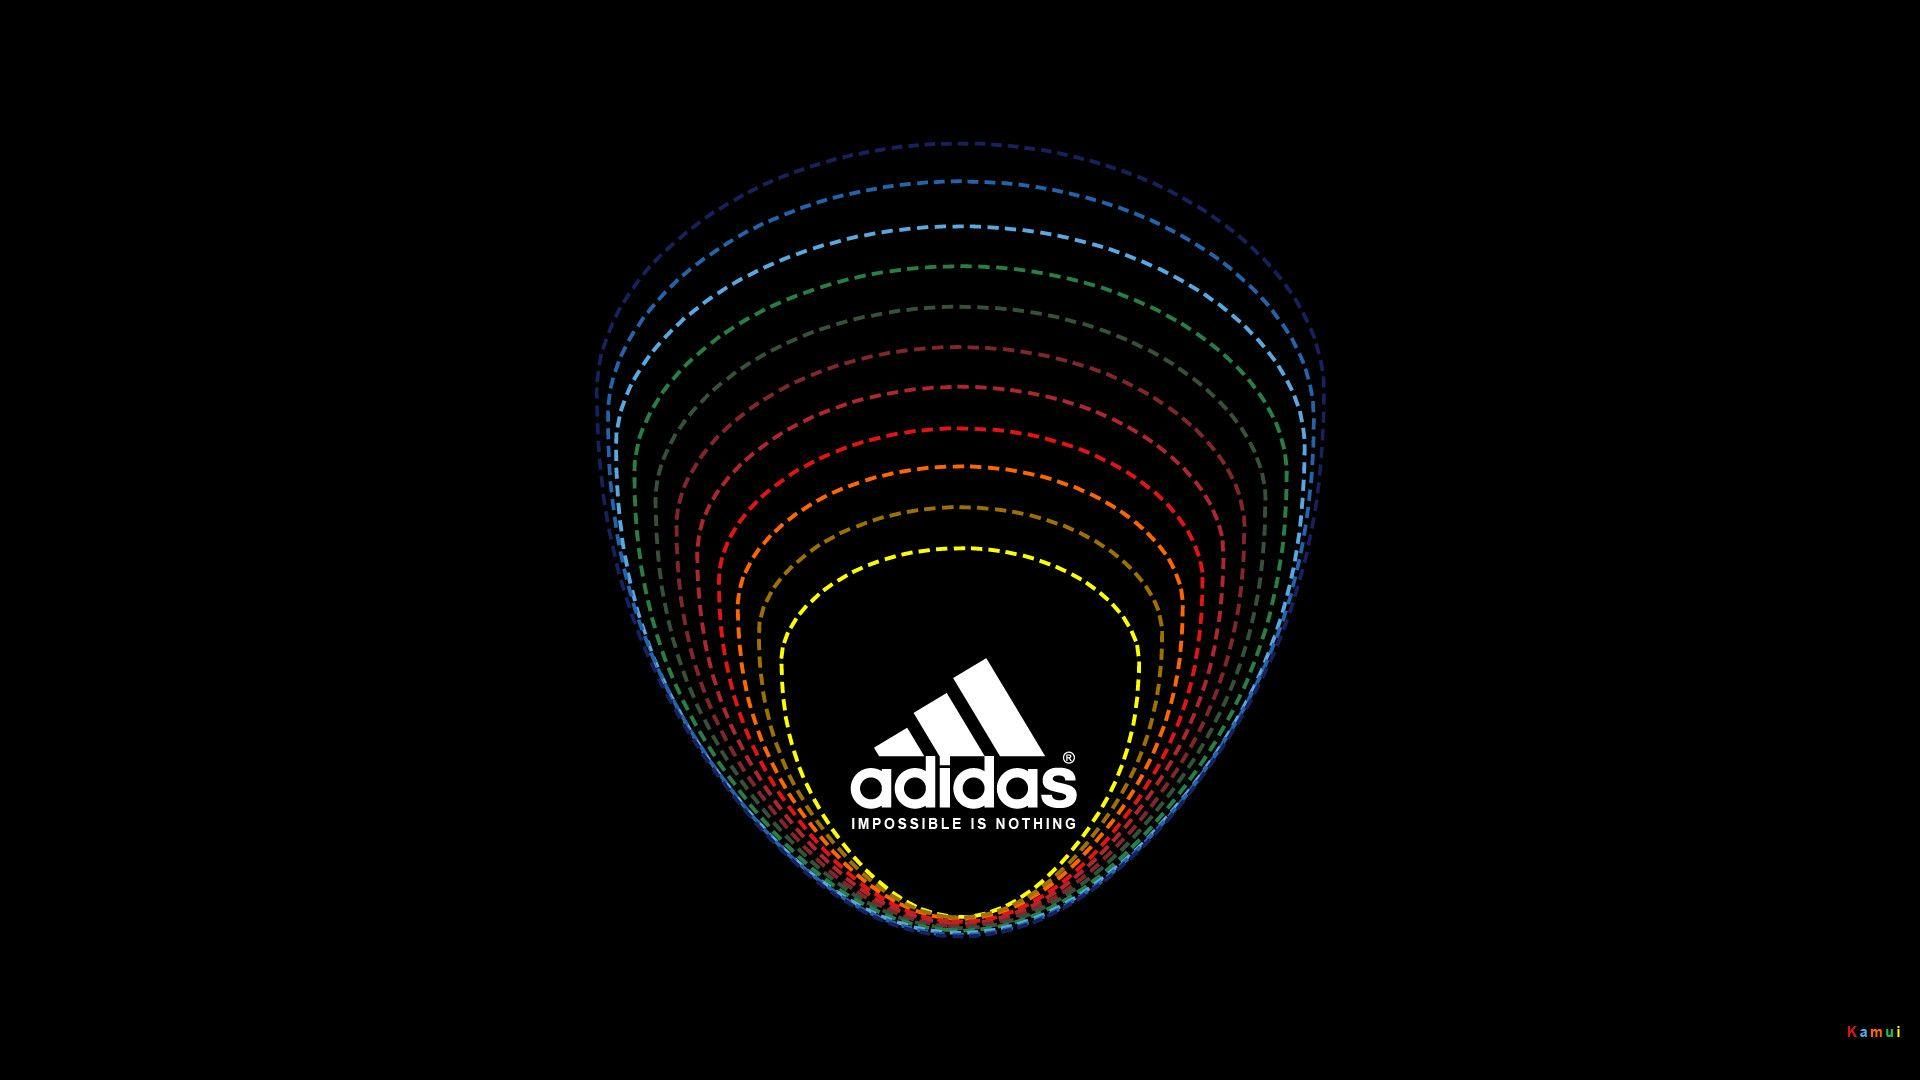 Wallpapers For > Adidas Originals Wallpaper Hd 1080p